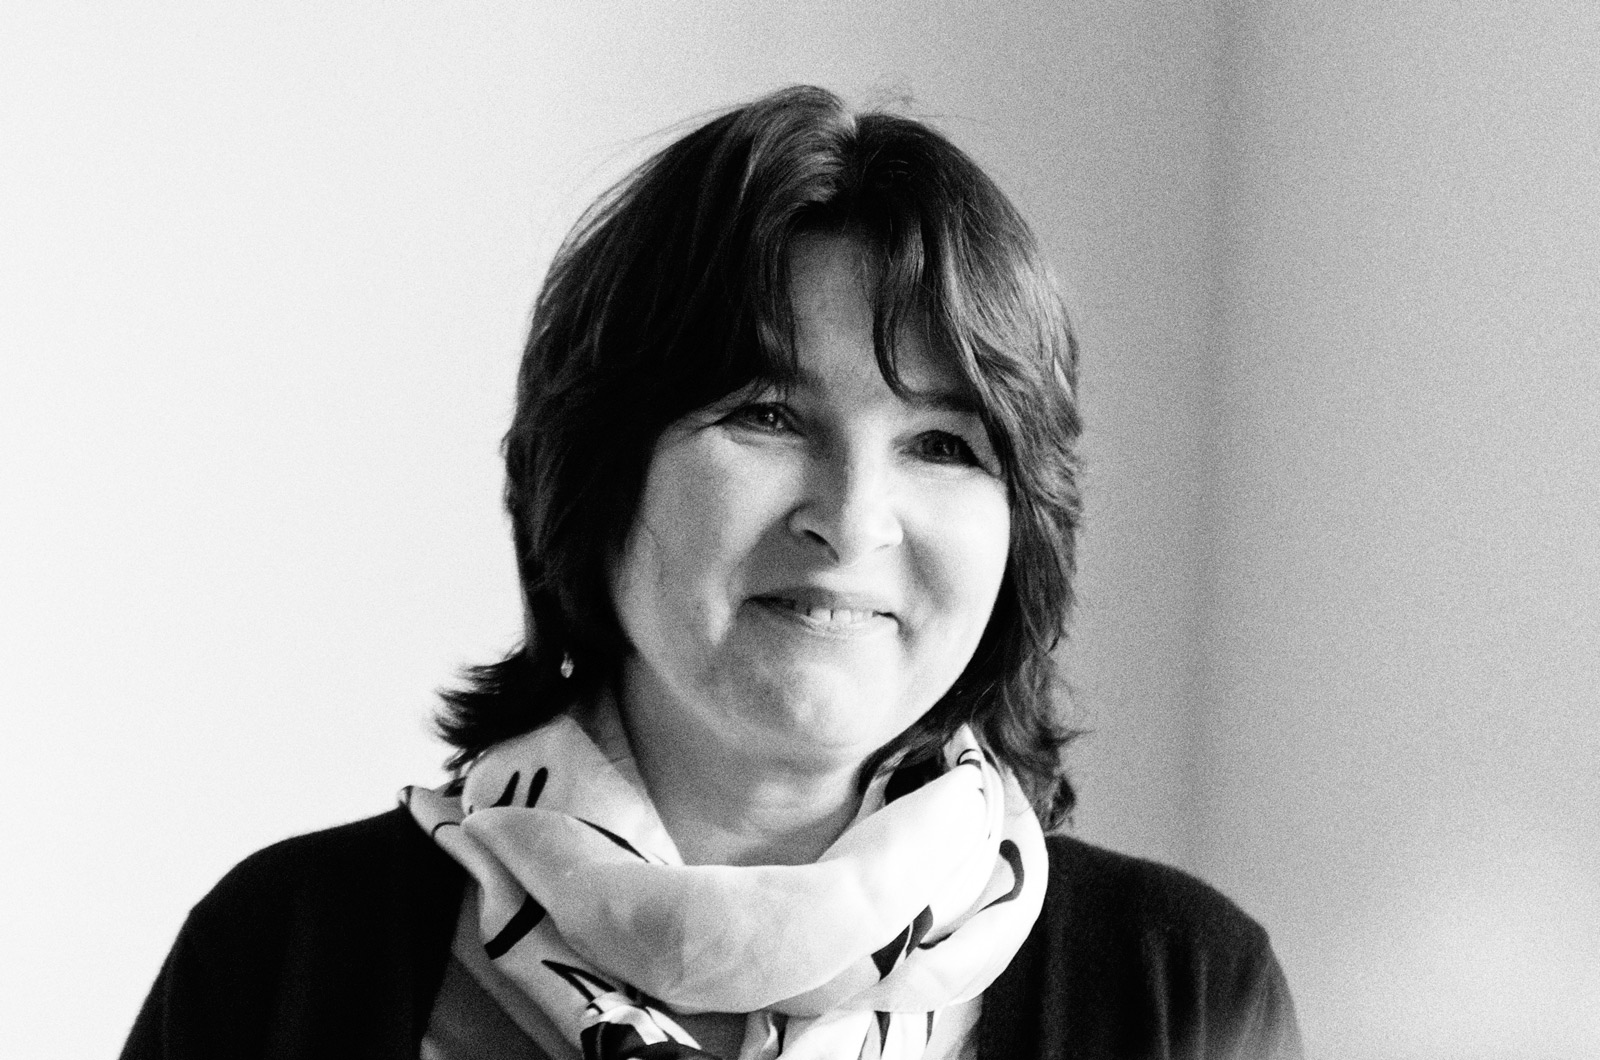 Kateřina Dubská